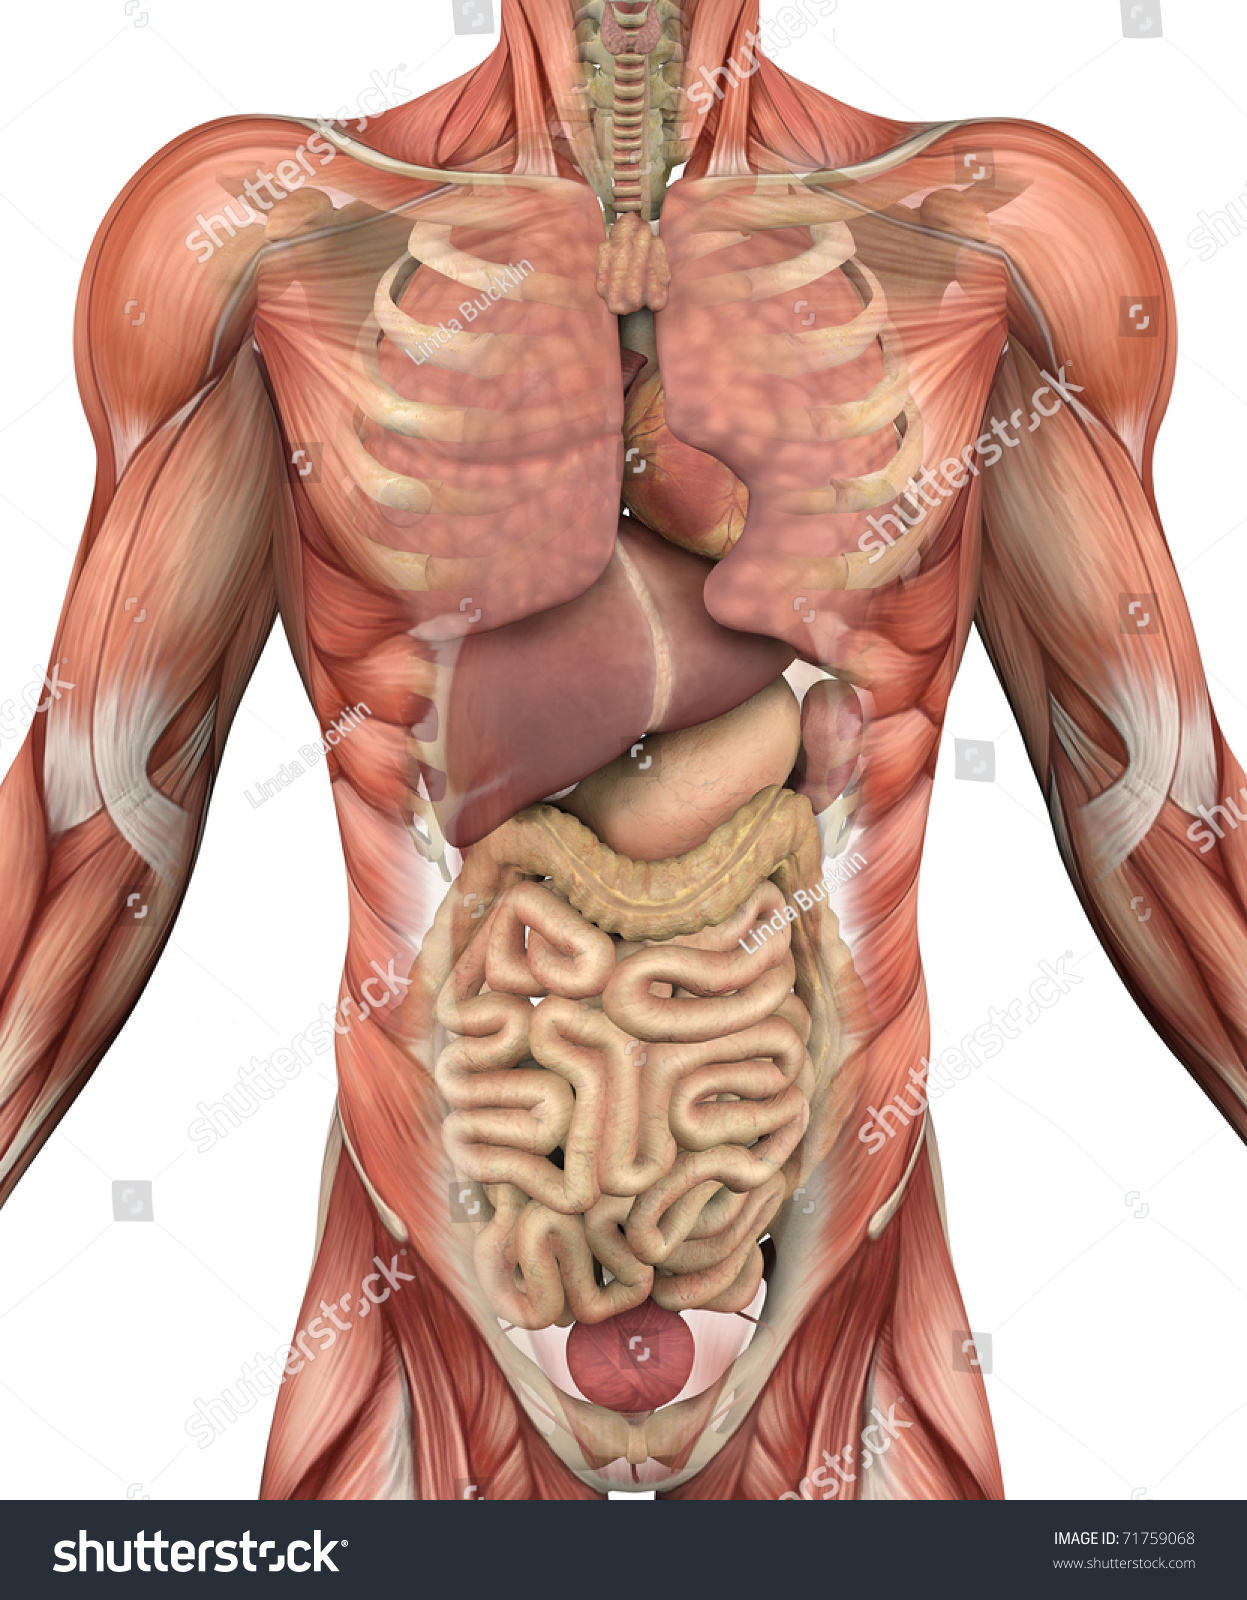 muscles male torso fadeaway reveal internal stock illustration, Muscles